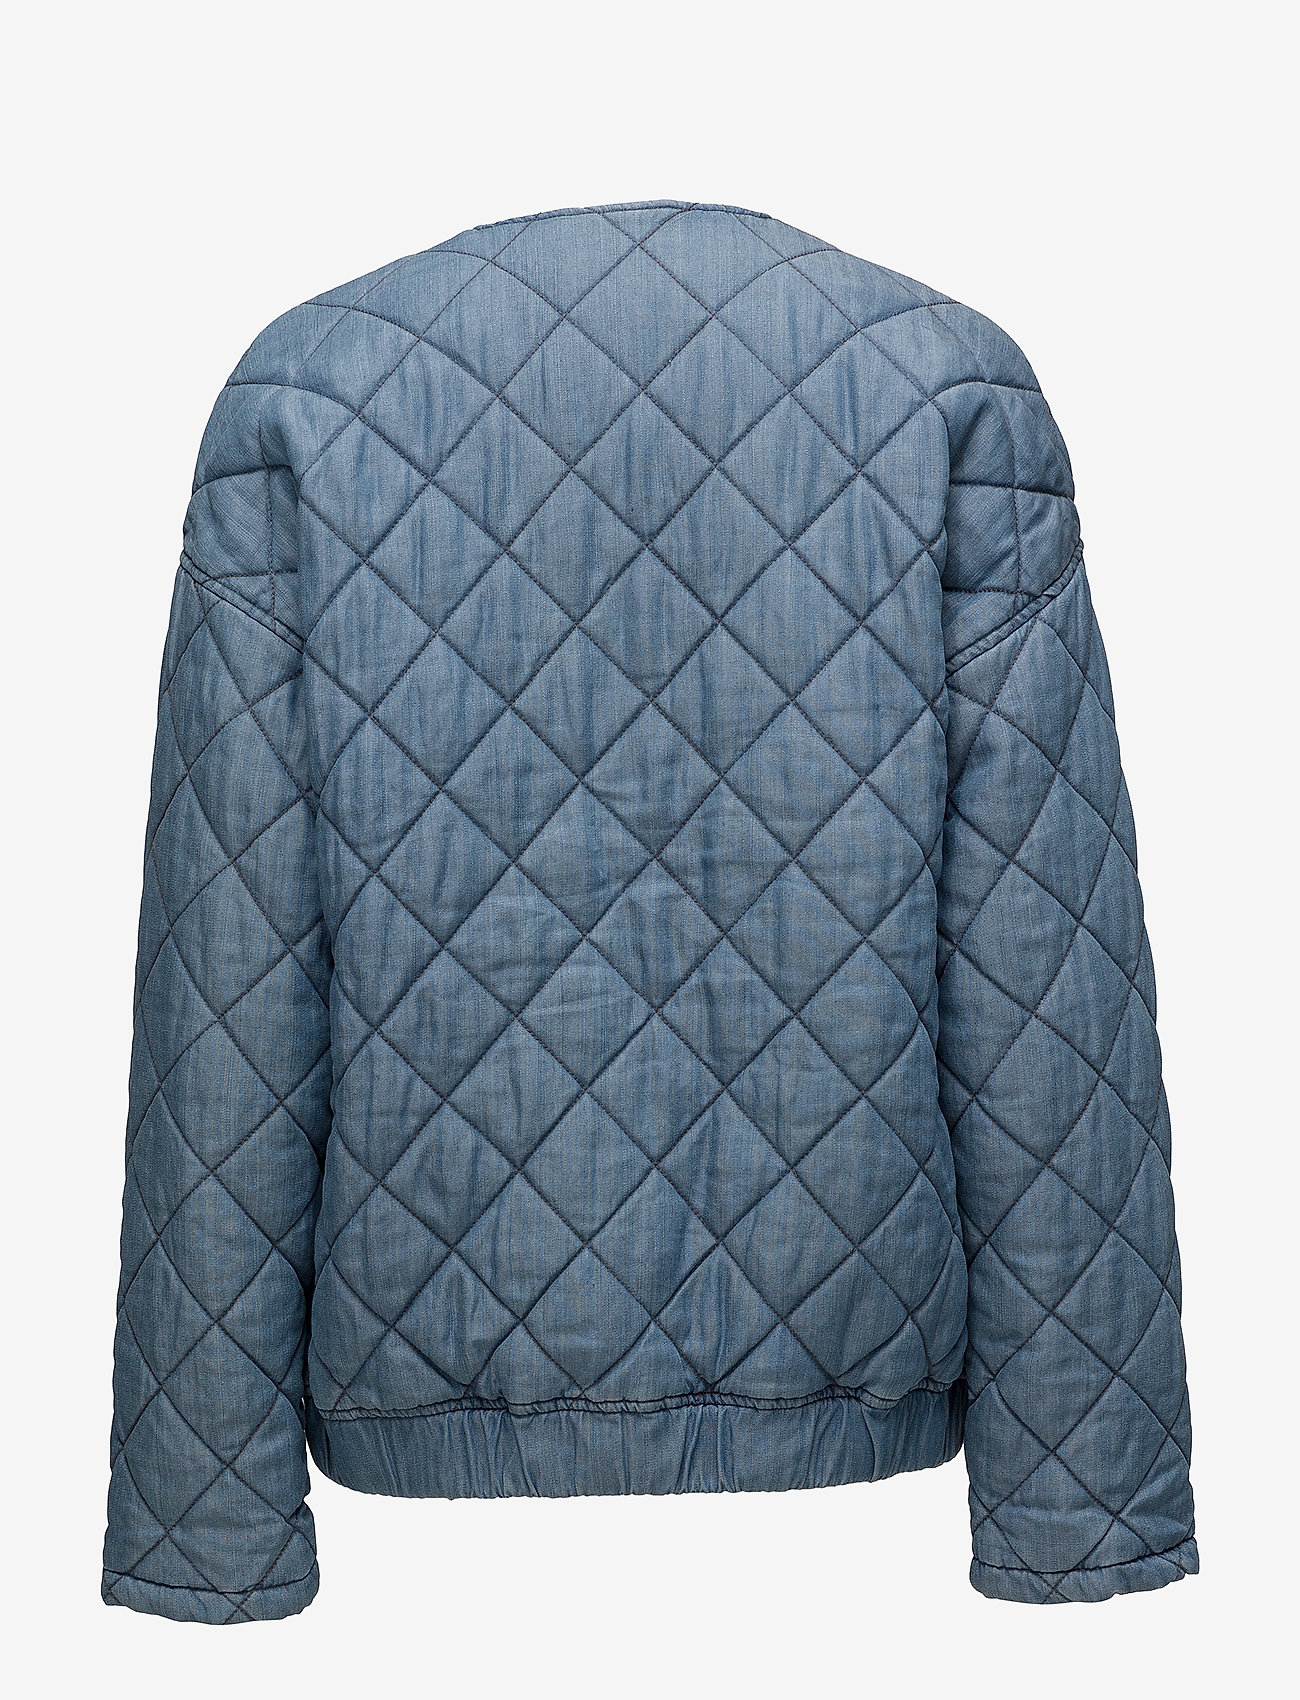 Twist & Tango Anouk Jacket - Jackets & Coats